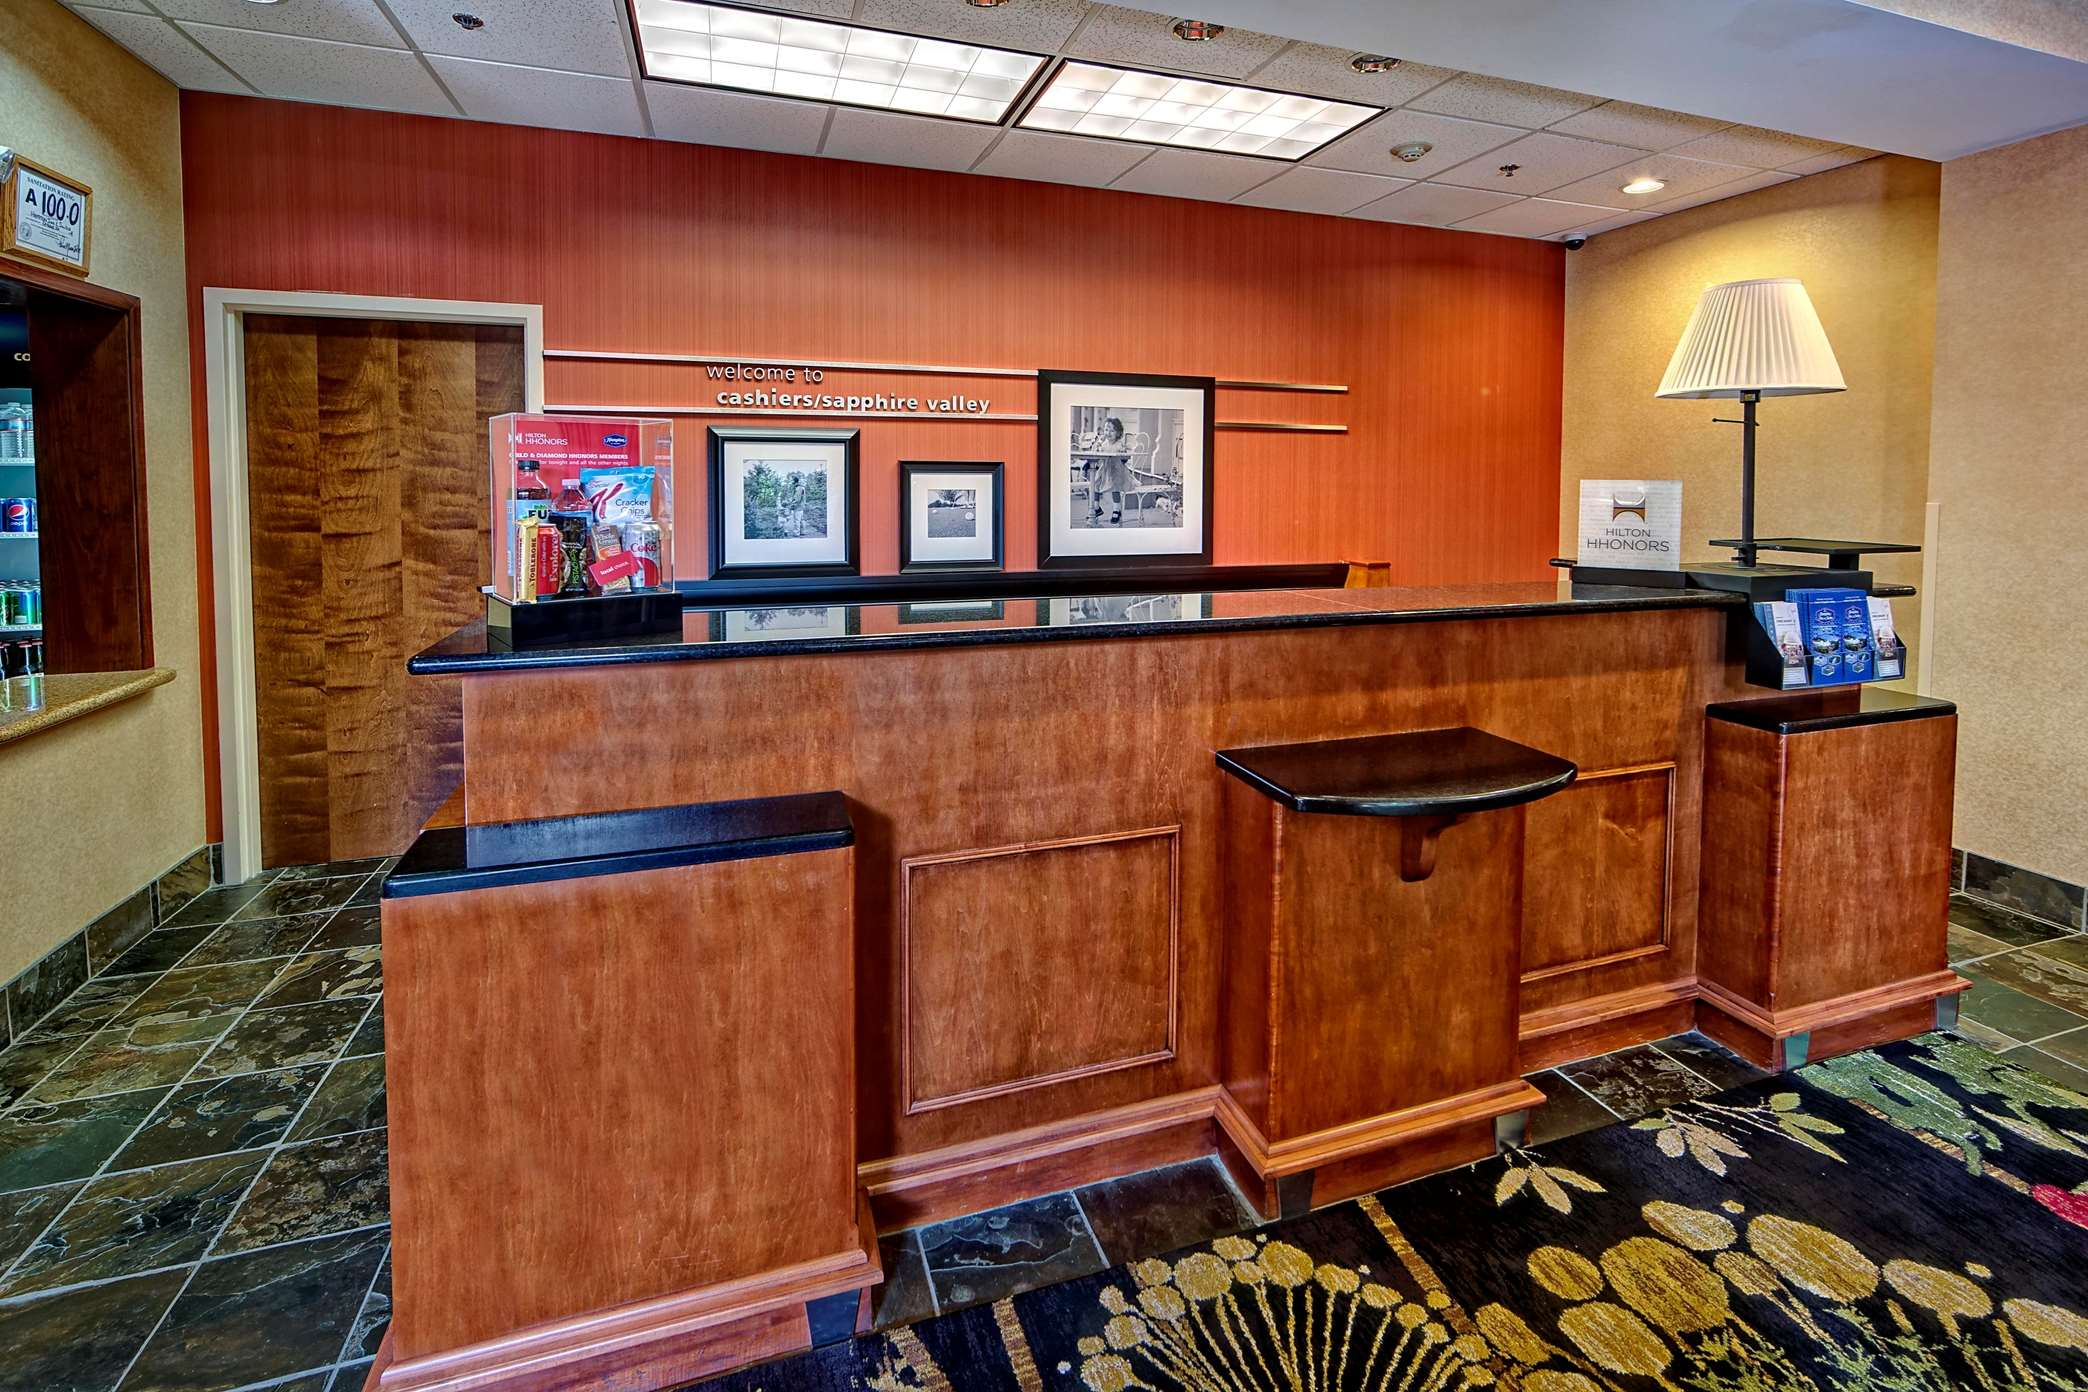 Hampton Inn & Suites Cashiers-Sapphire Valley image 15